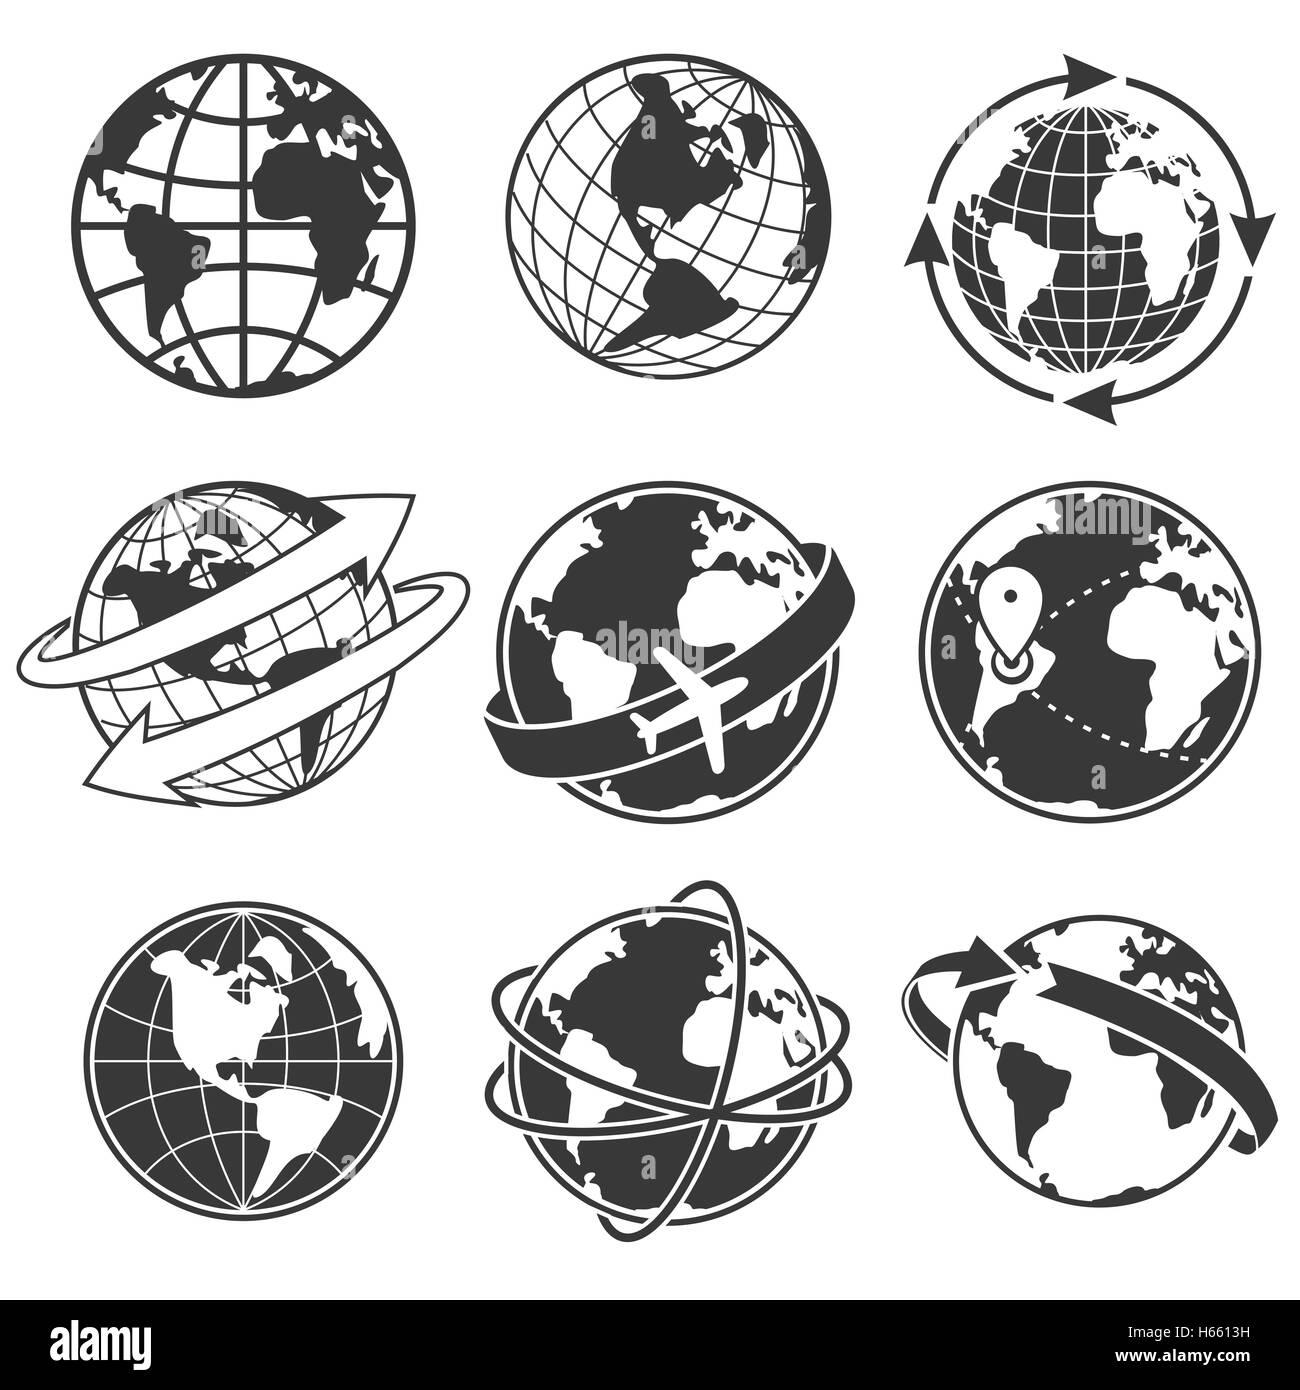 Globe concept illustration set, monochrome - Stock Image